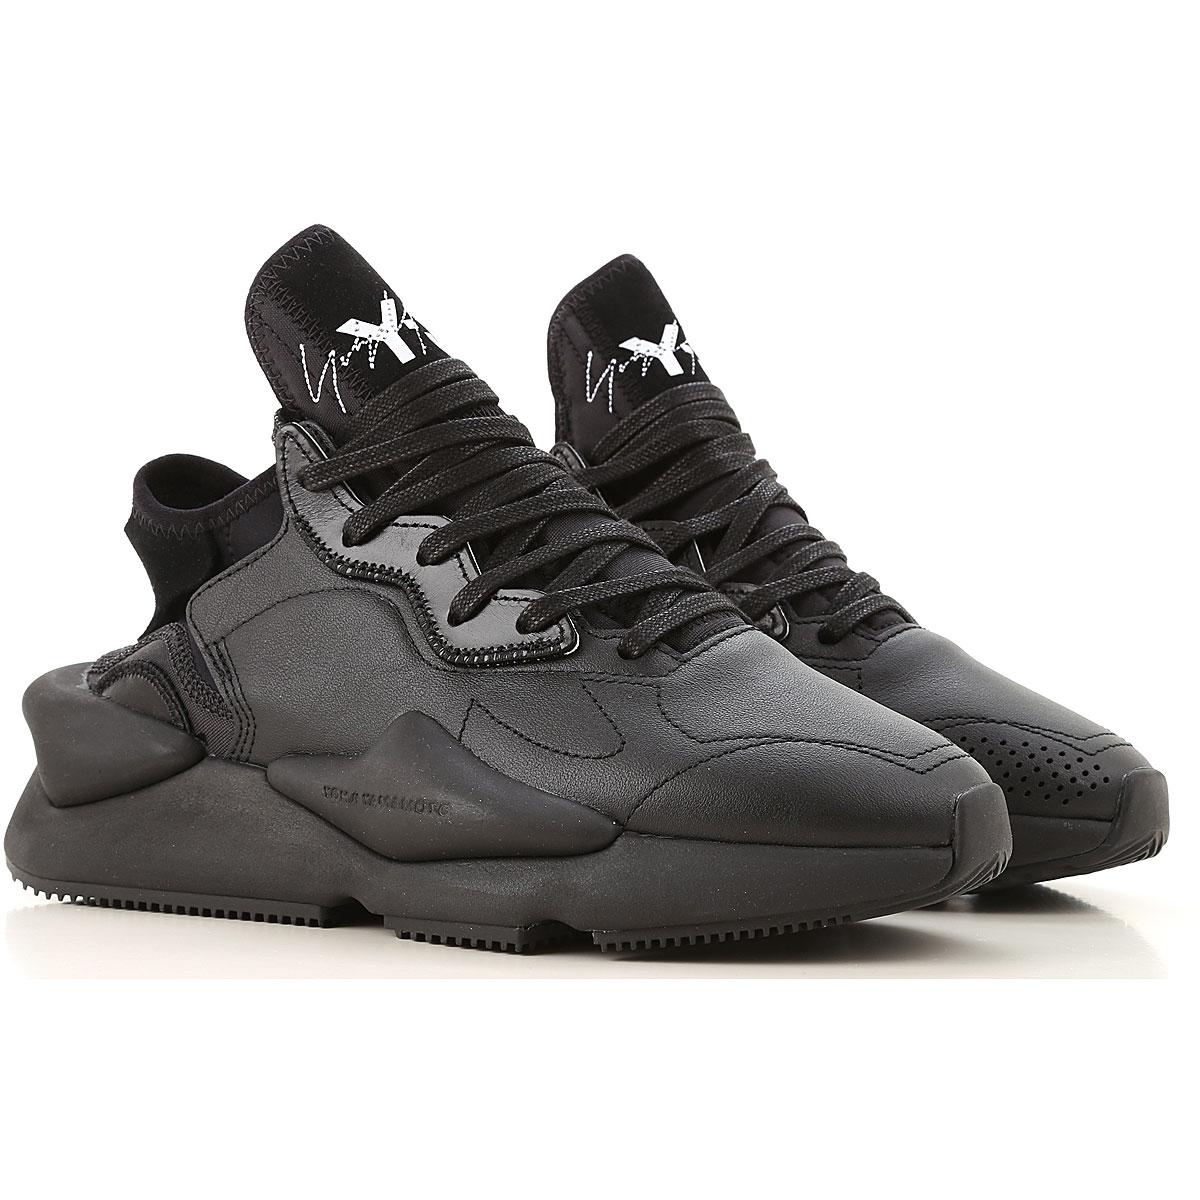 Y3 by Yohji Yamamoto Sneakers for Women On Sale, Black, Leather, 2019, 10 6 6.5 7 8.5 9 9.5